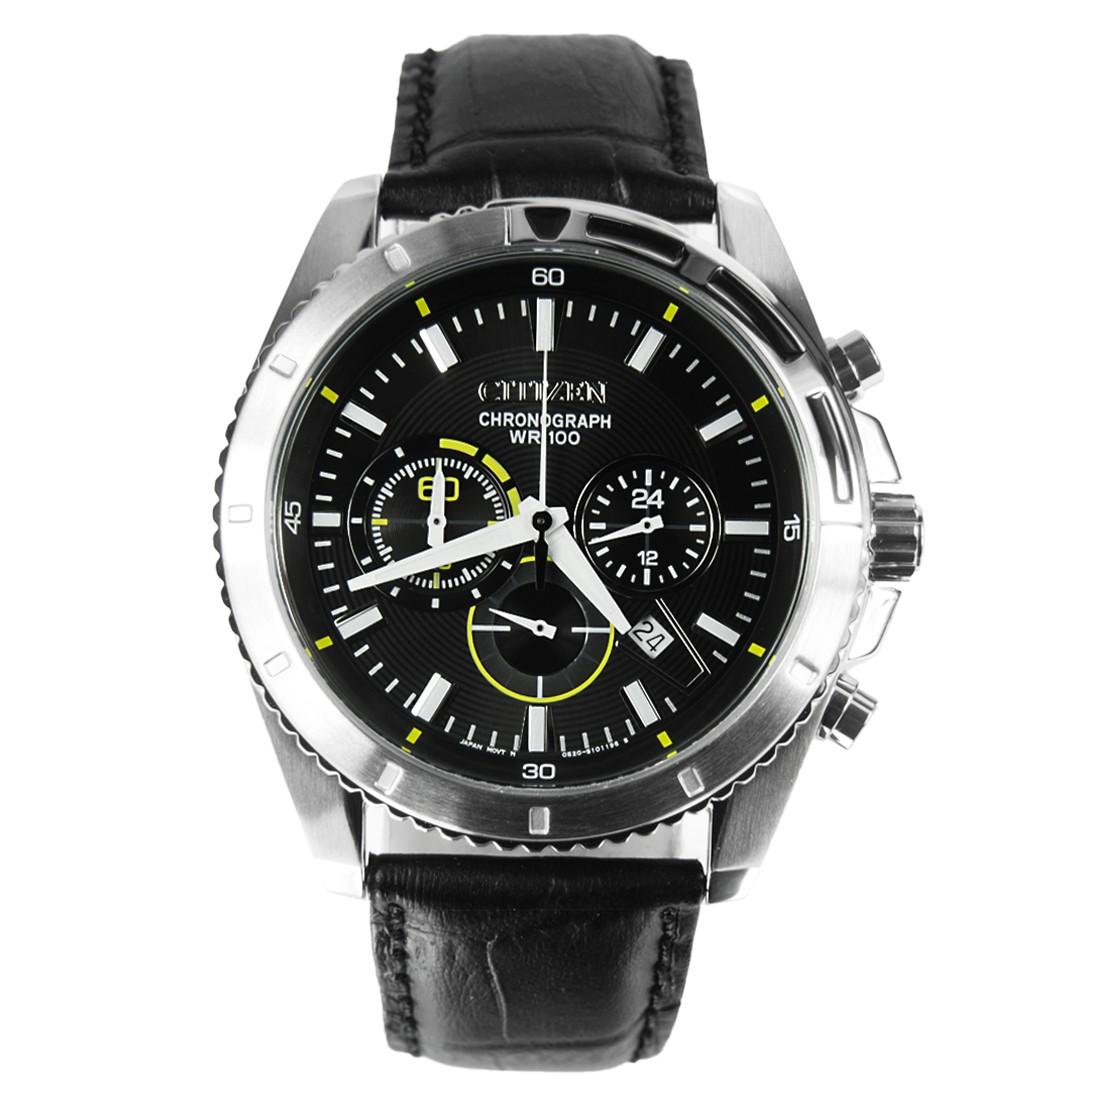 Citizen Chronograph Sports Men's Watch รุ่น AN8015-01E